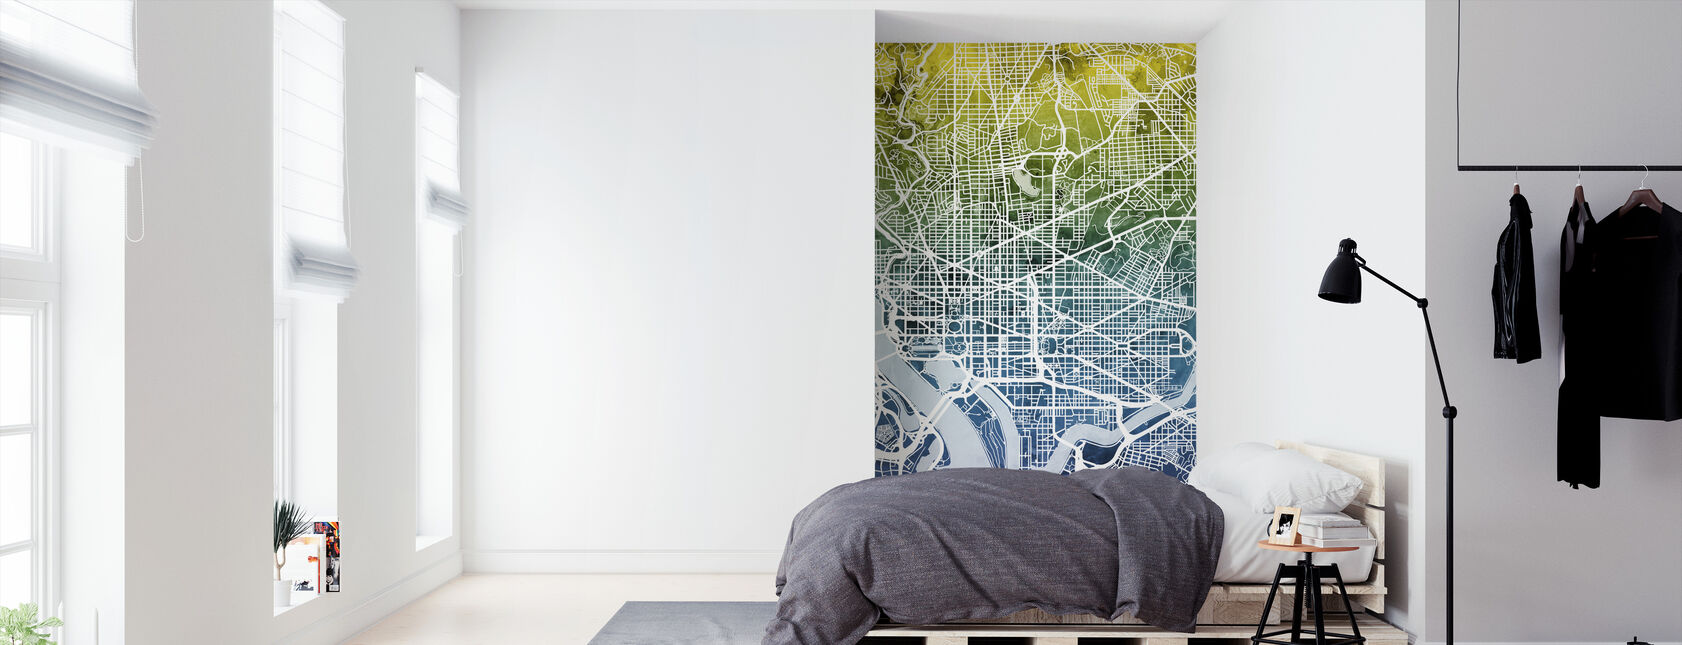 Washington DC Street Map Bluegreen - Tapet - Soverom